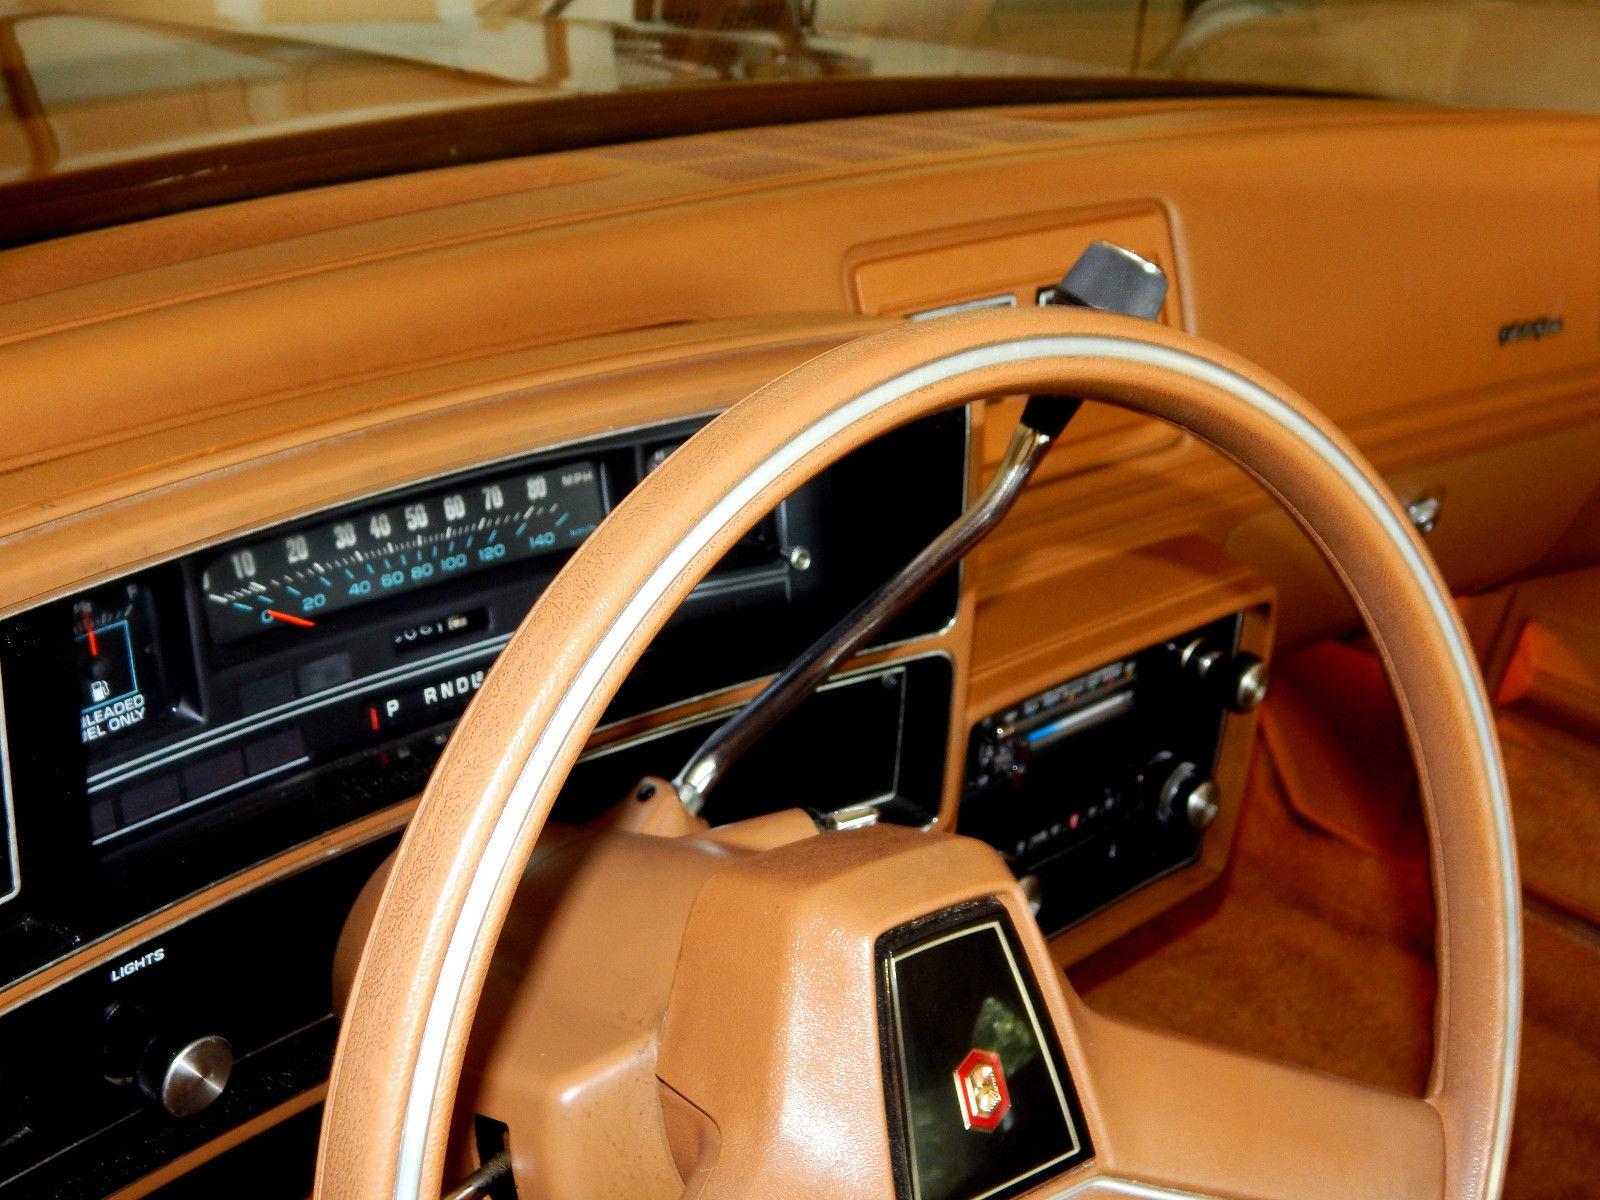 Original Malibu Classic Landau Mint Condition on Replace Valve Cover Gasket